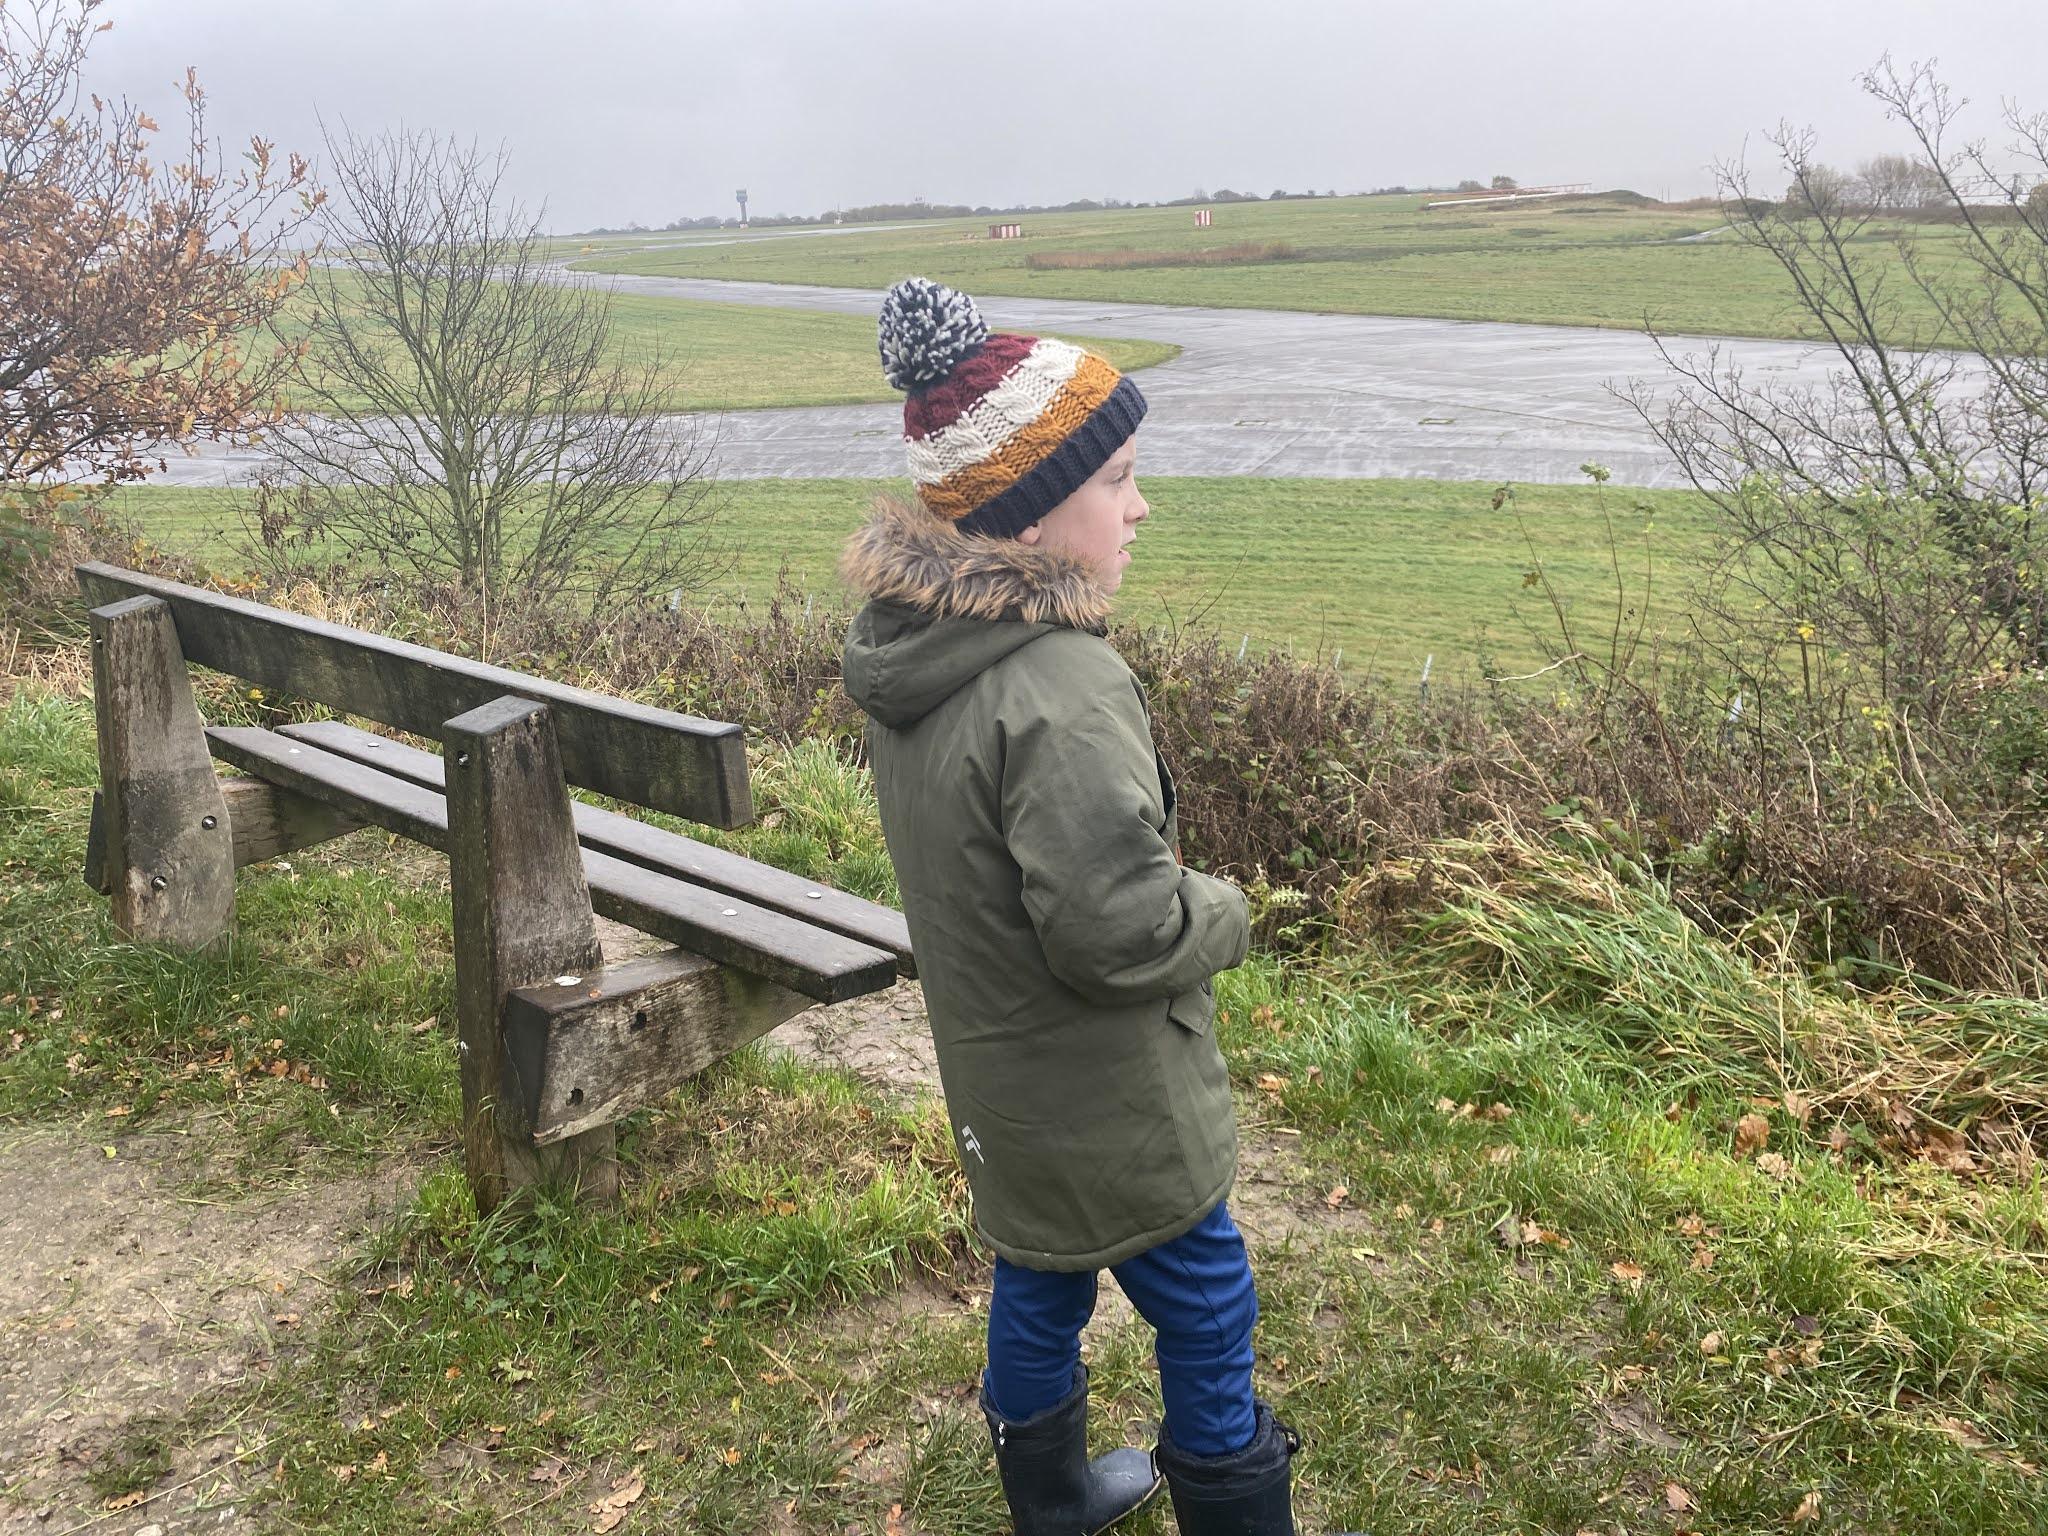 Boy overlooking a runway